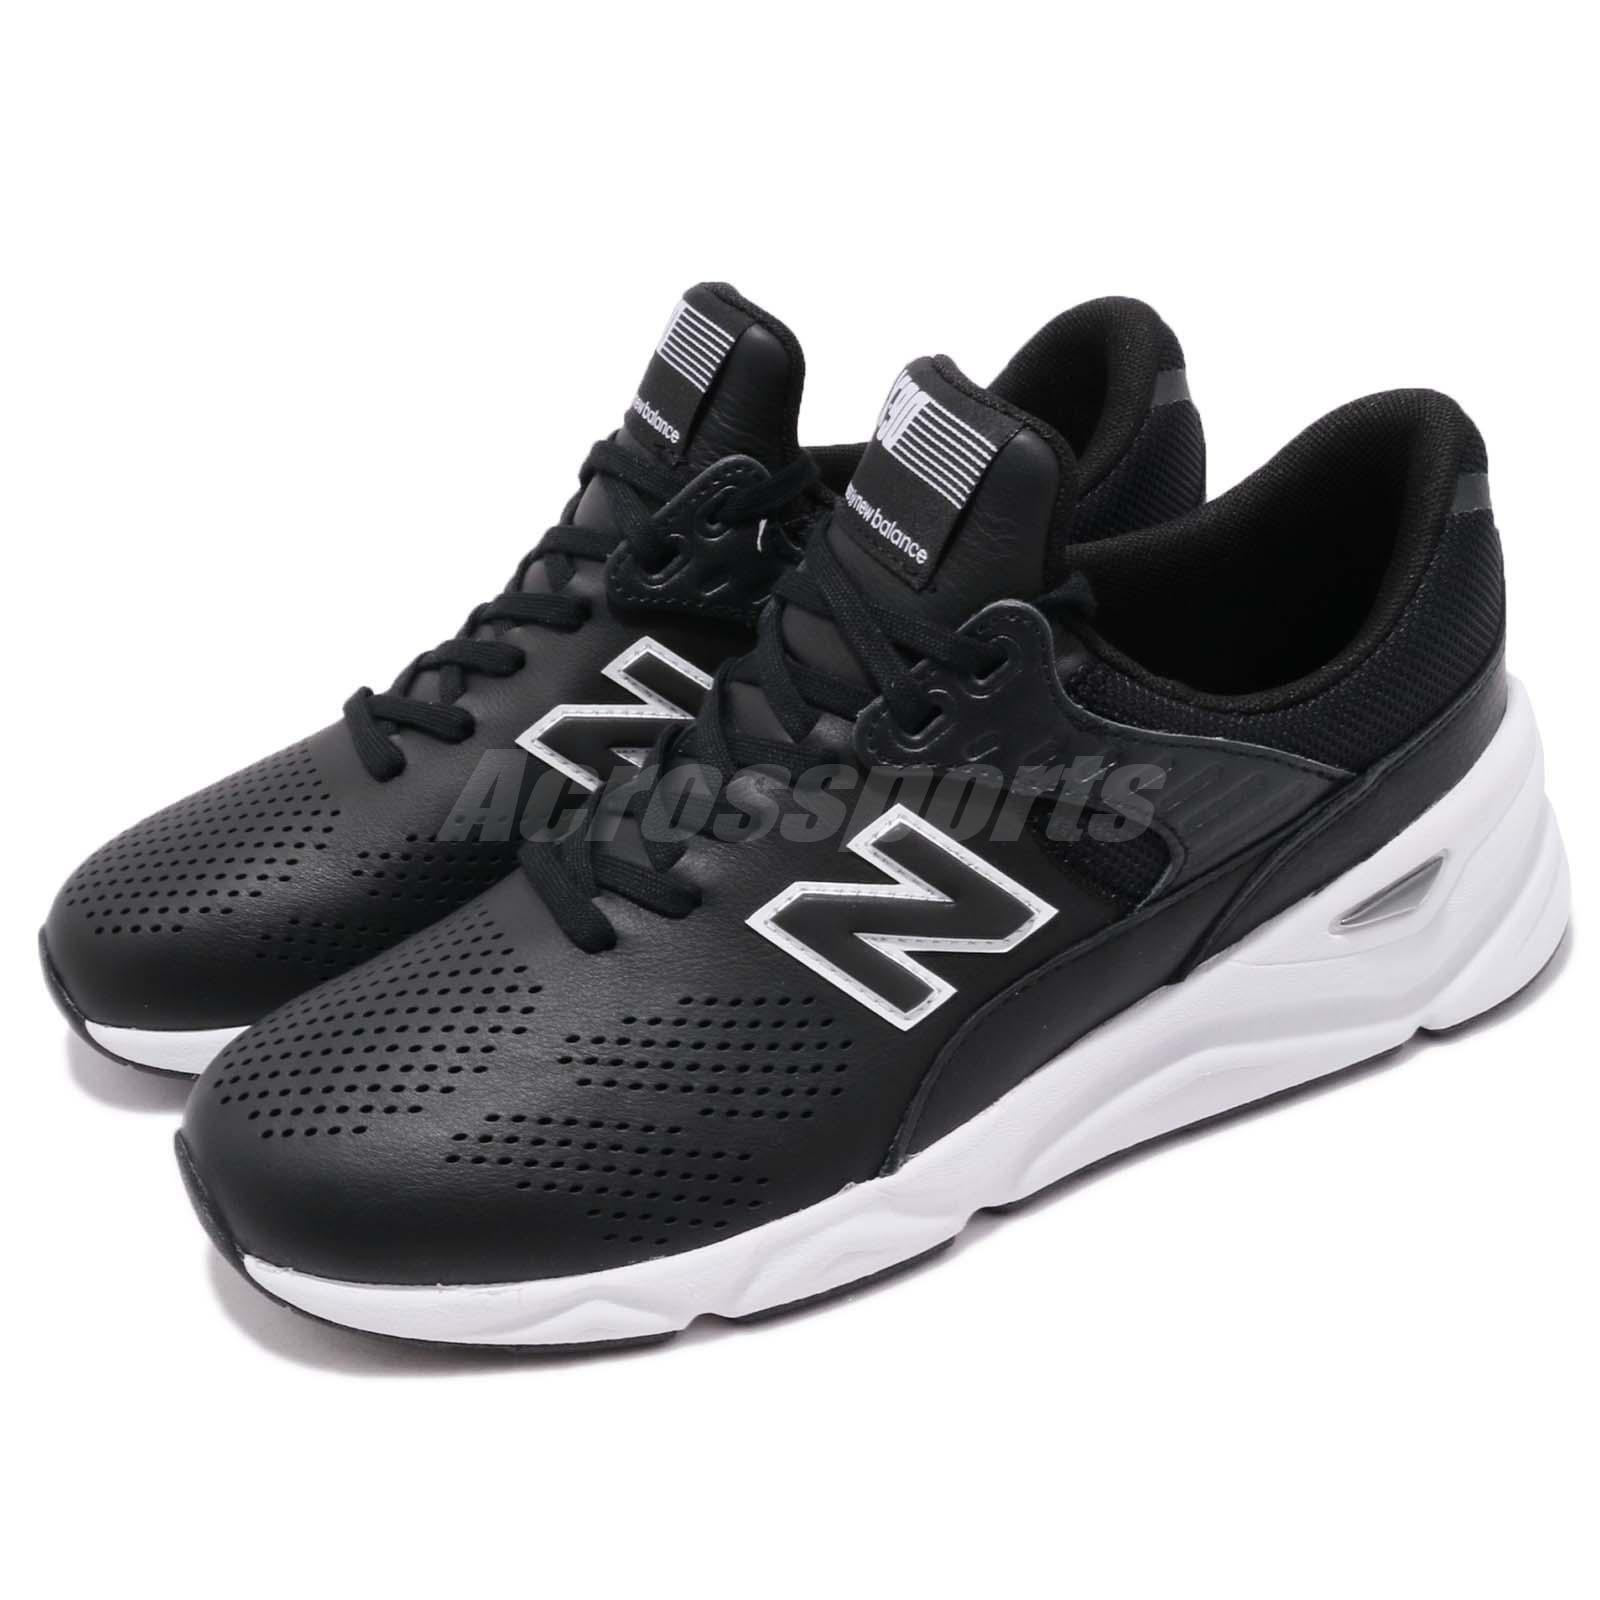 New balance MSX90CLD D Negro blancoo Zapatos Tenis Informales Correr Para hombres MSX 90 cldd